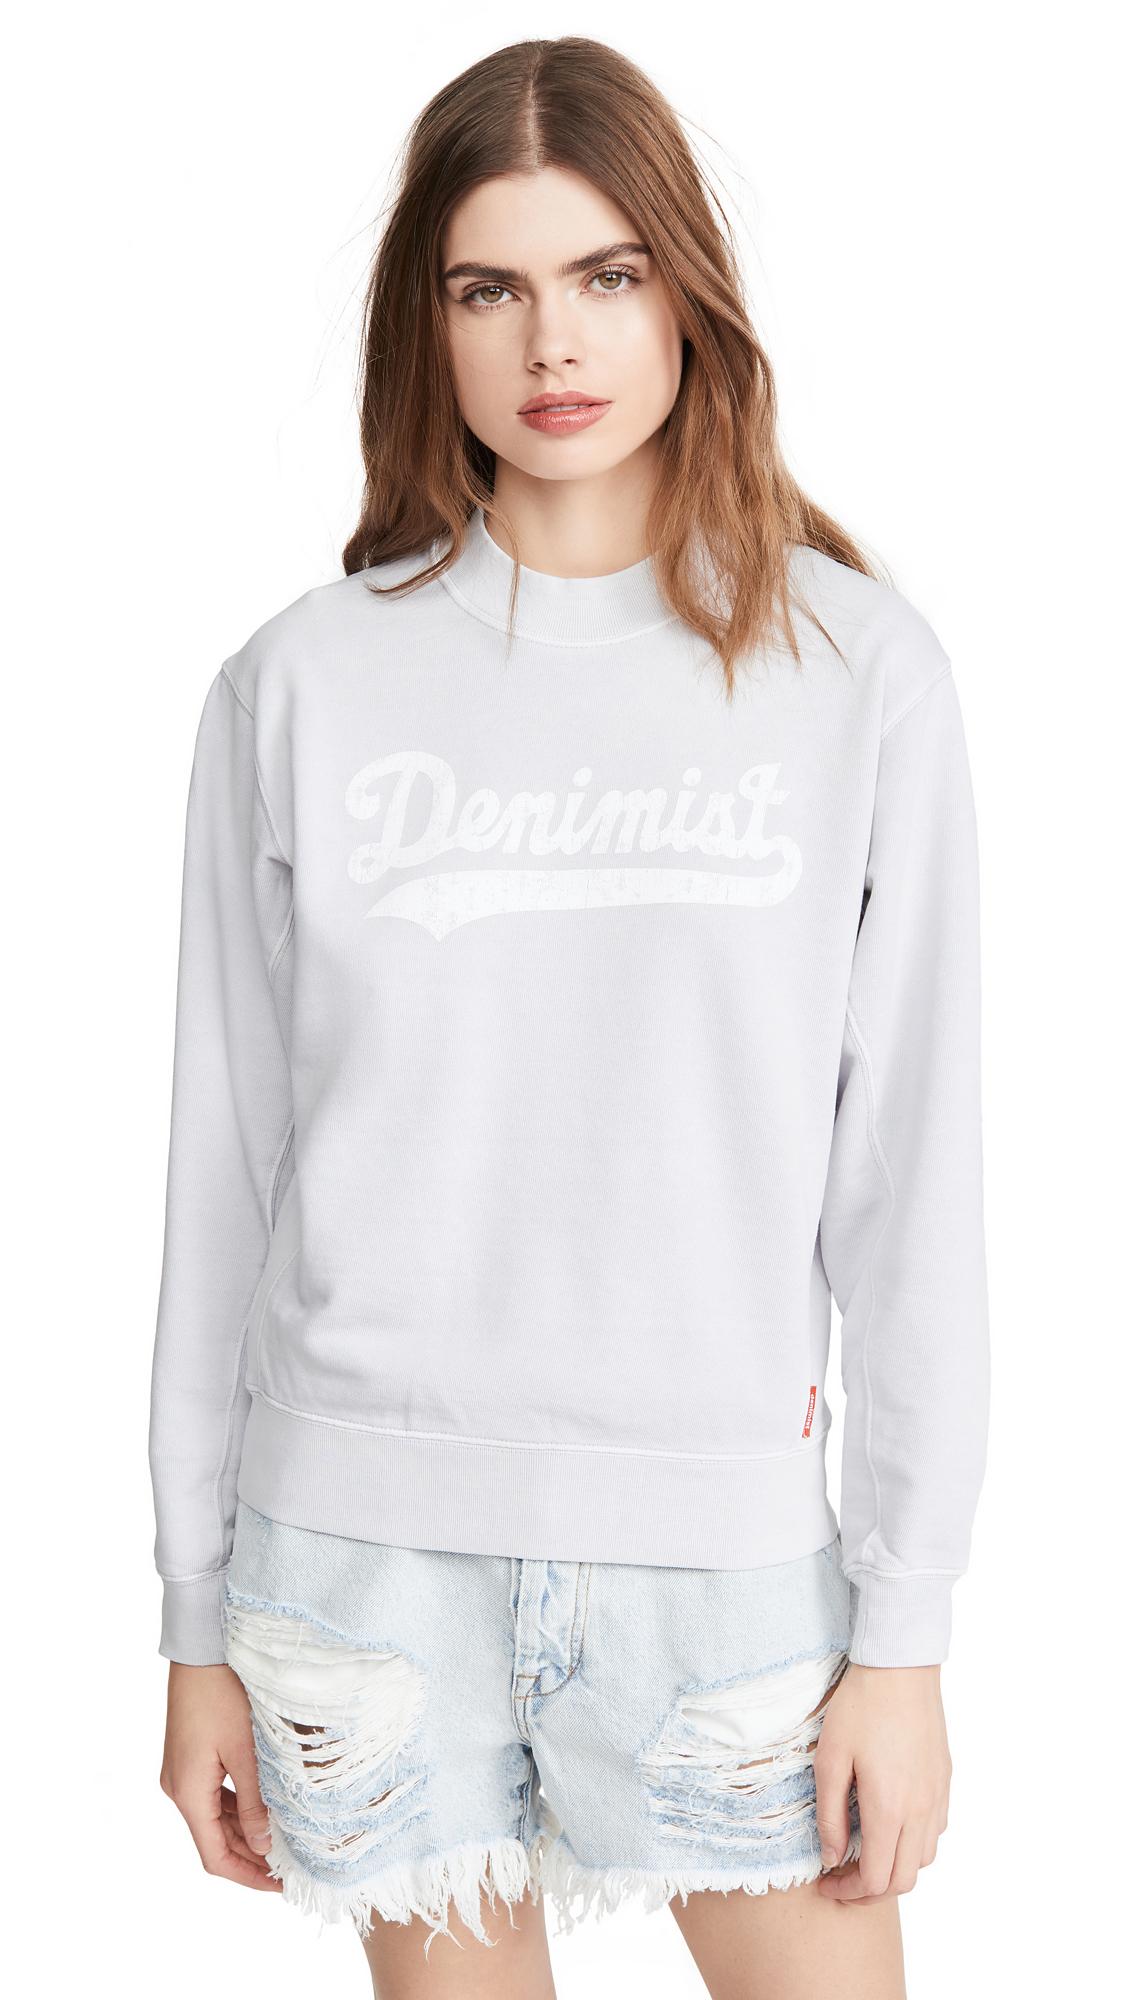 Denimist Logo Sweatshirt - 40% Off Sale